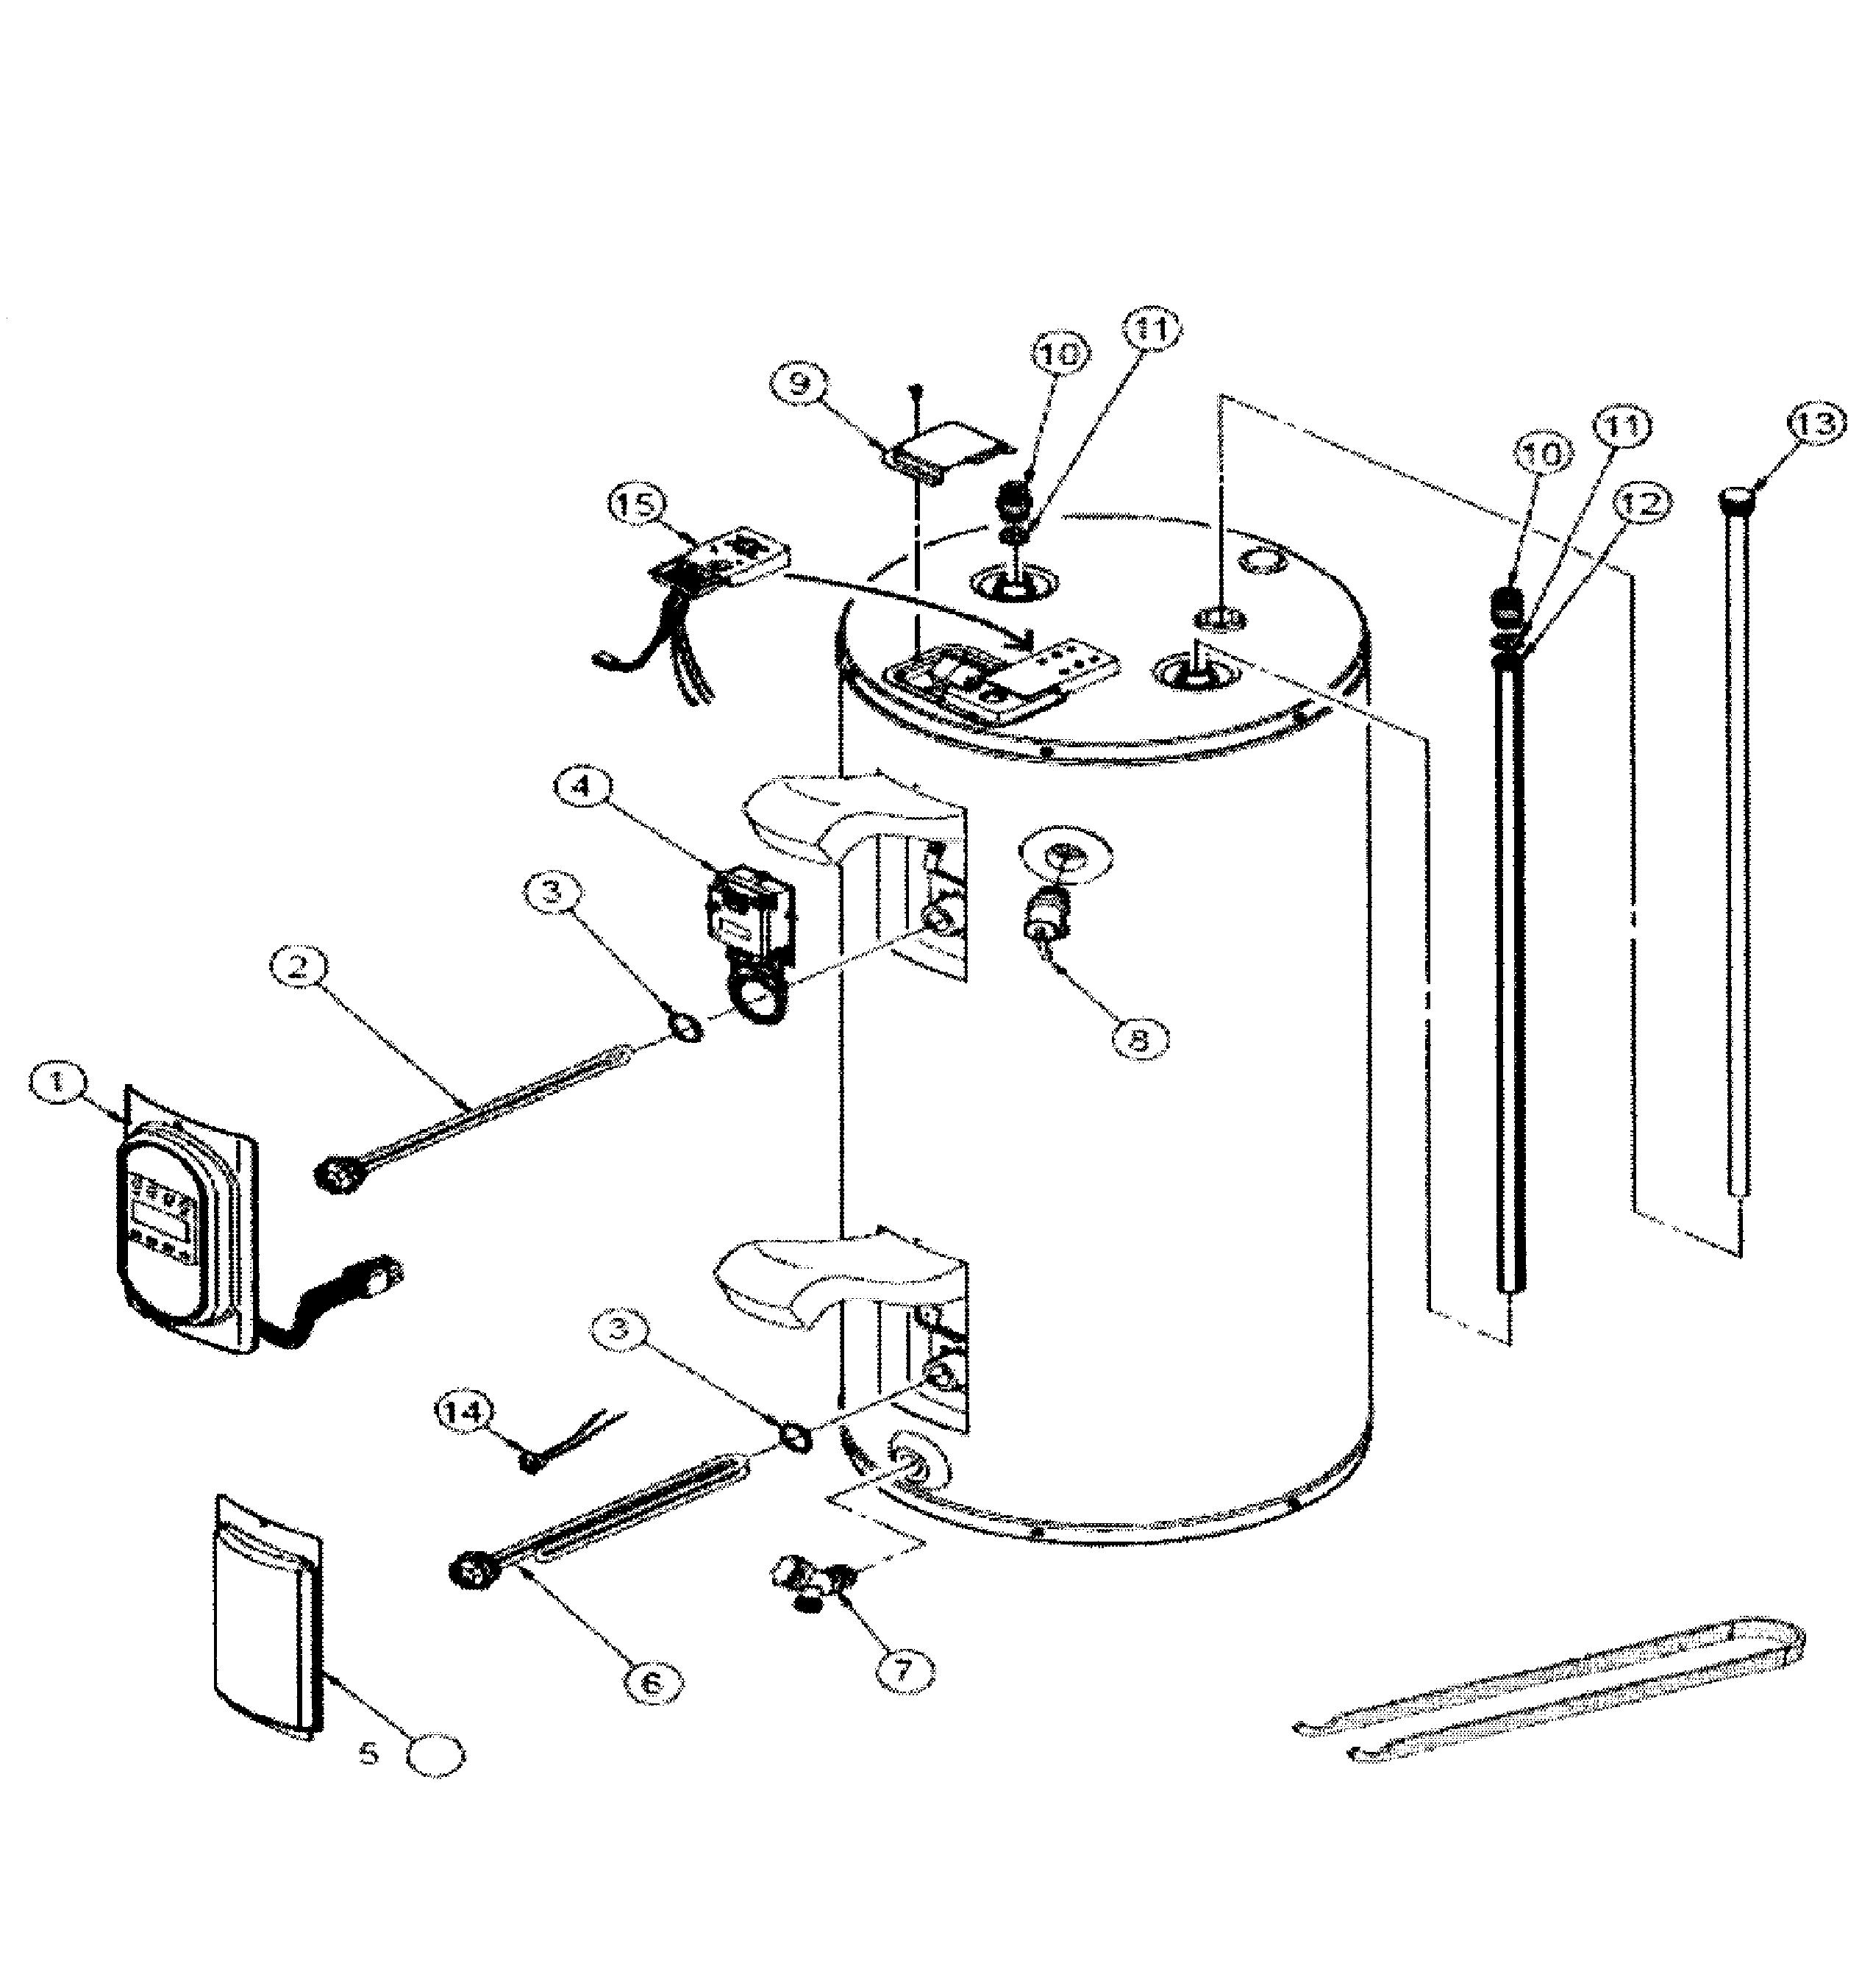 Whirlpool gas water heater manual